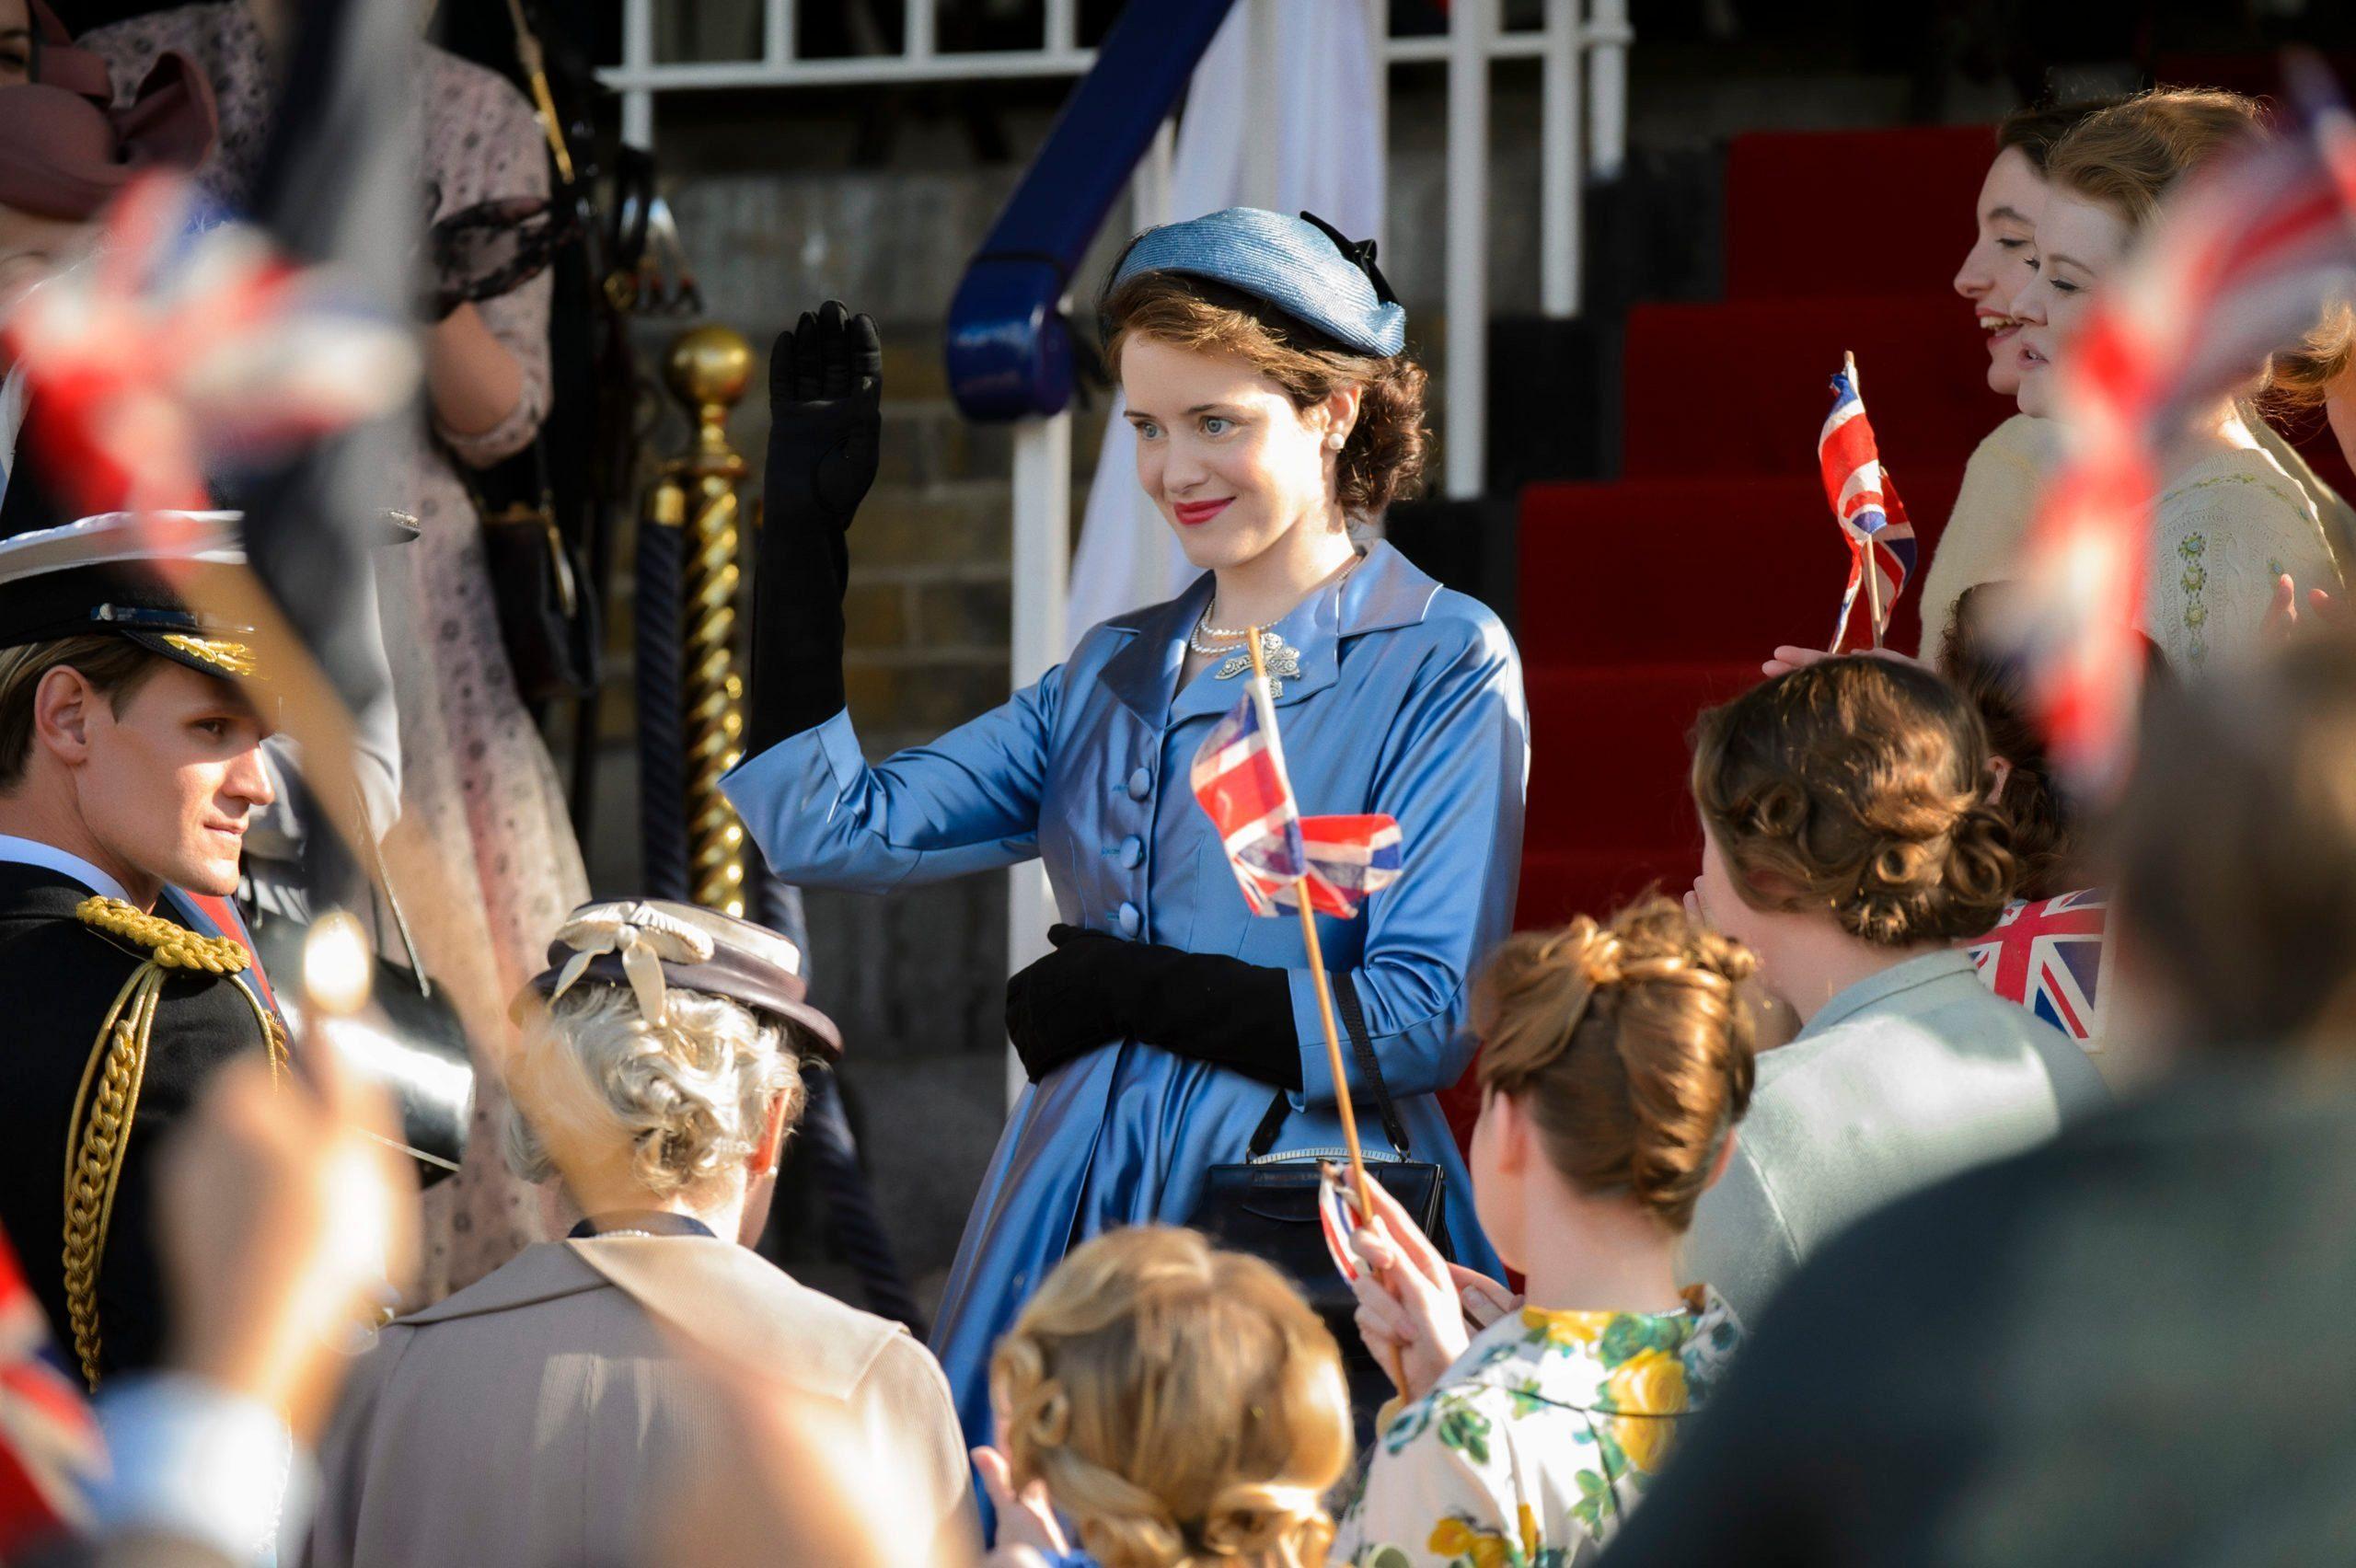 Queen Elizabeth on The Crown